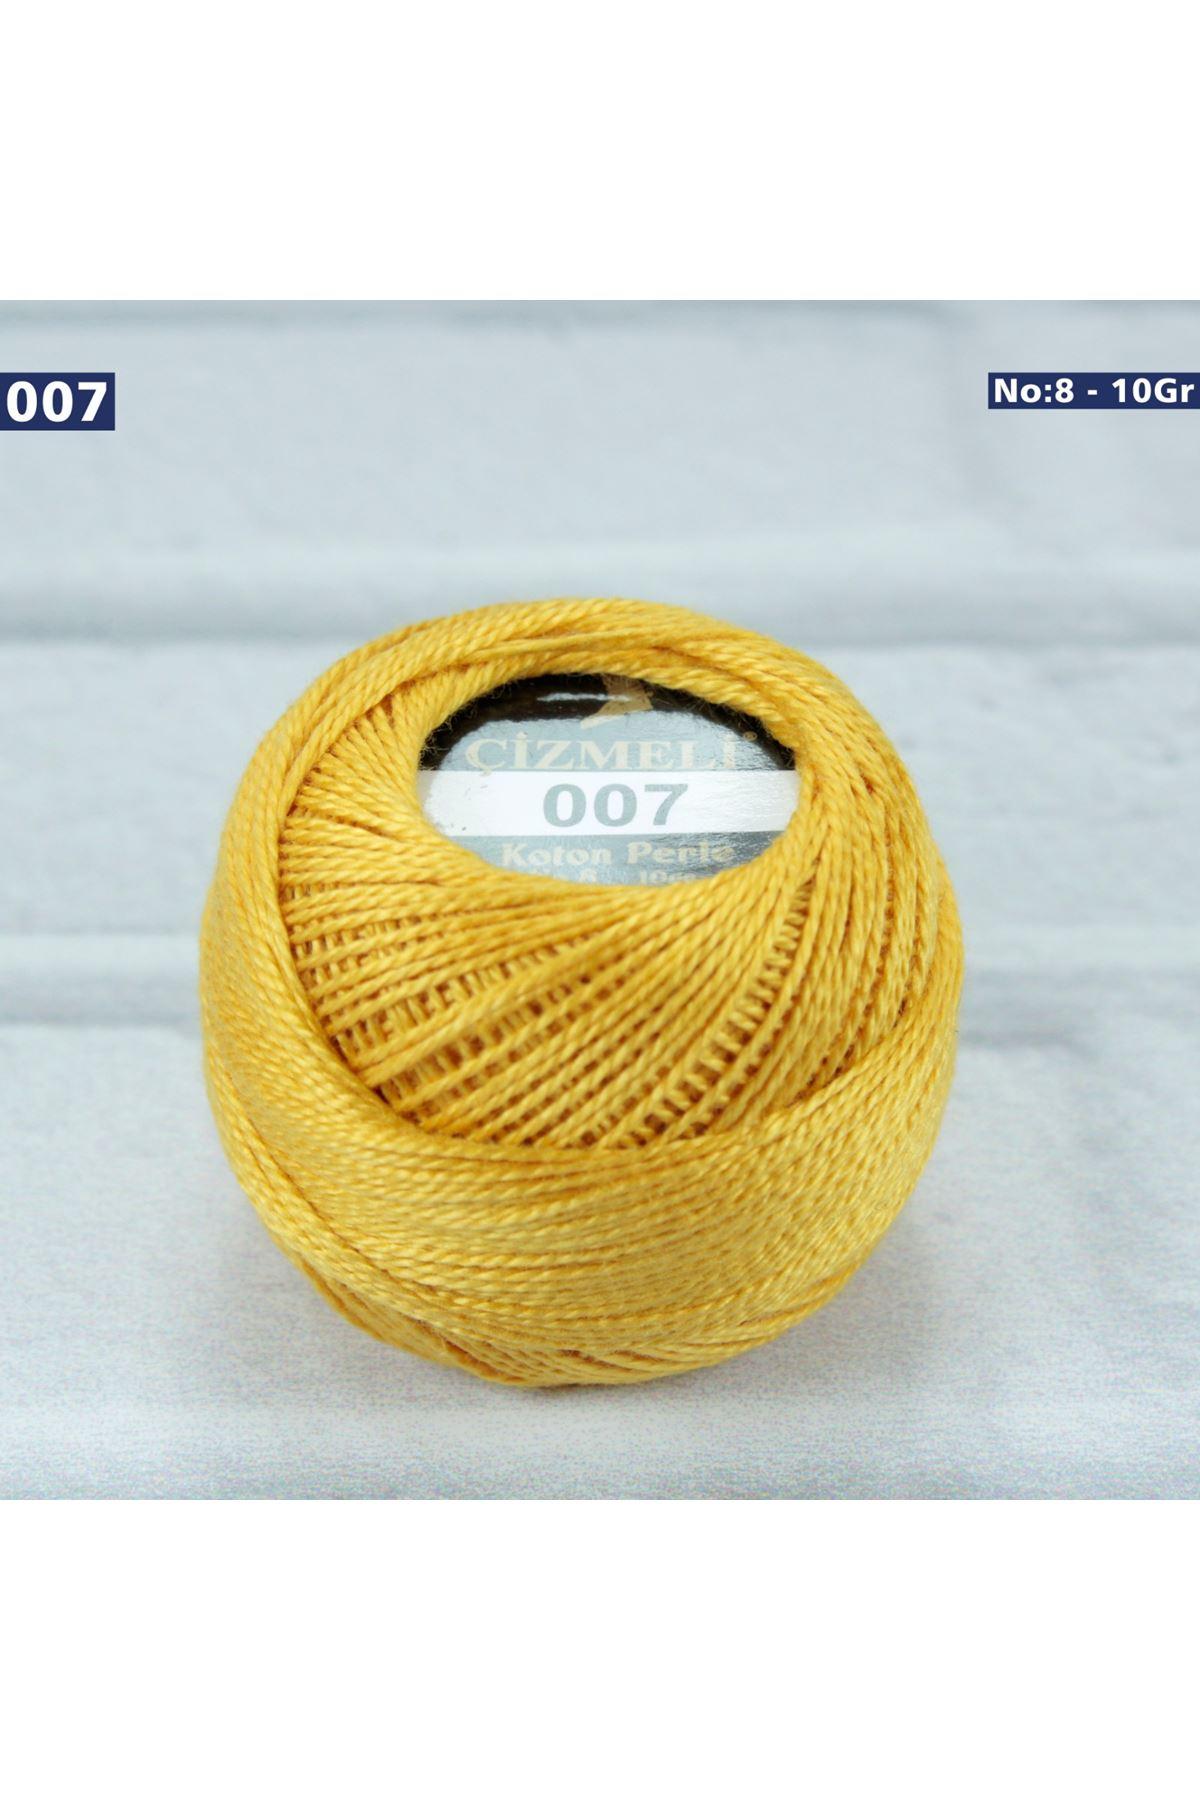 Çizmeli Cotton Perle Nakış İpliği No: 007